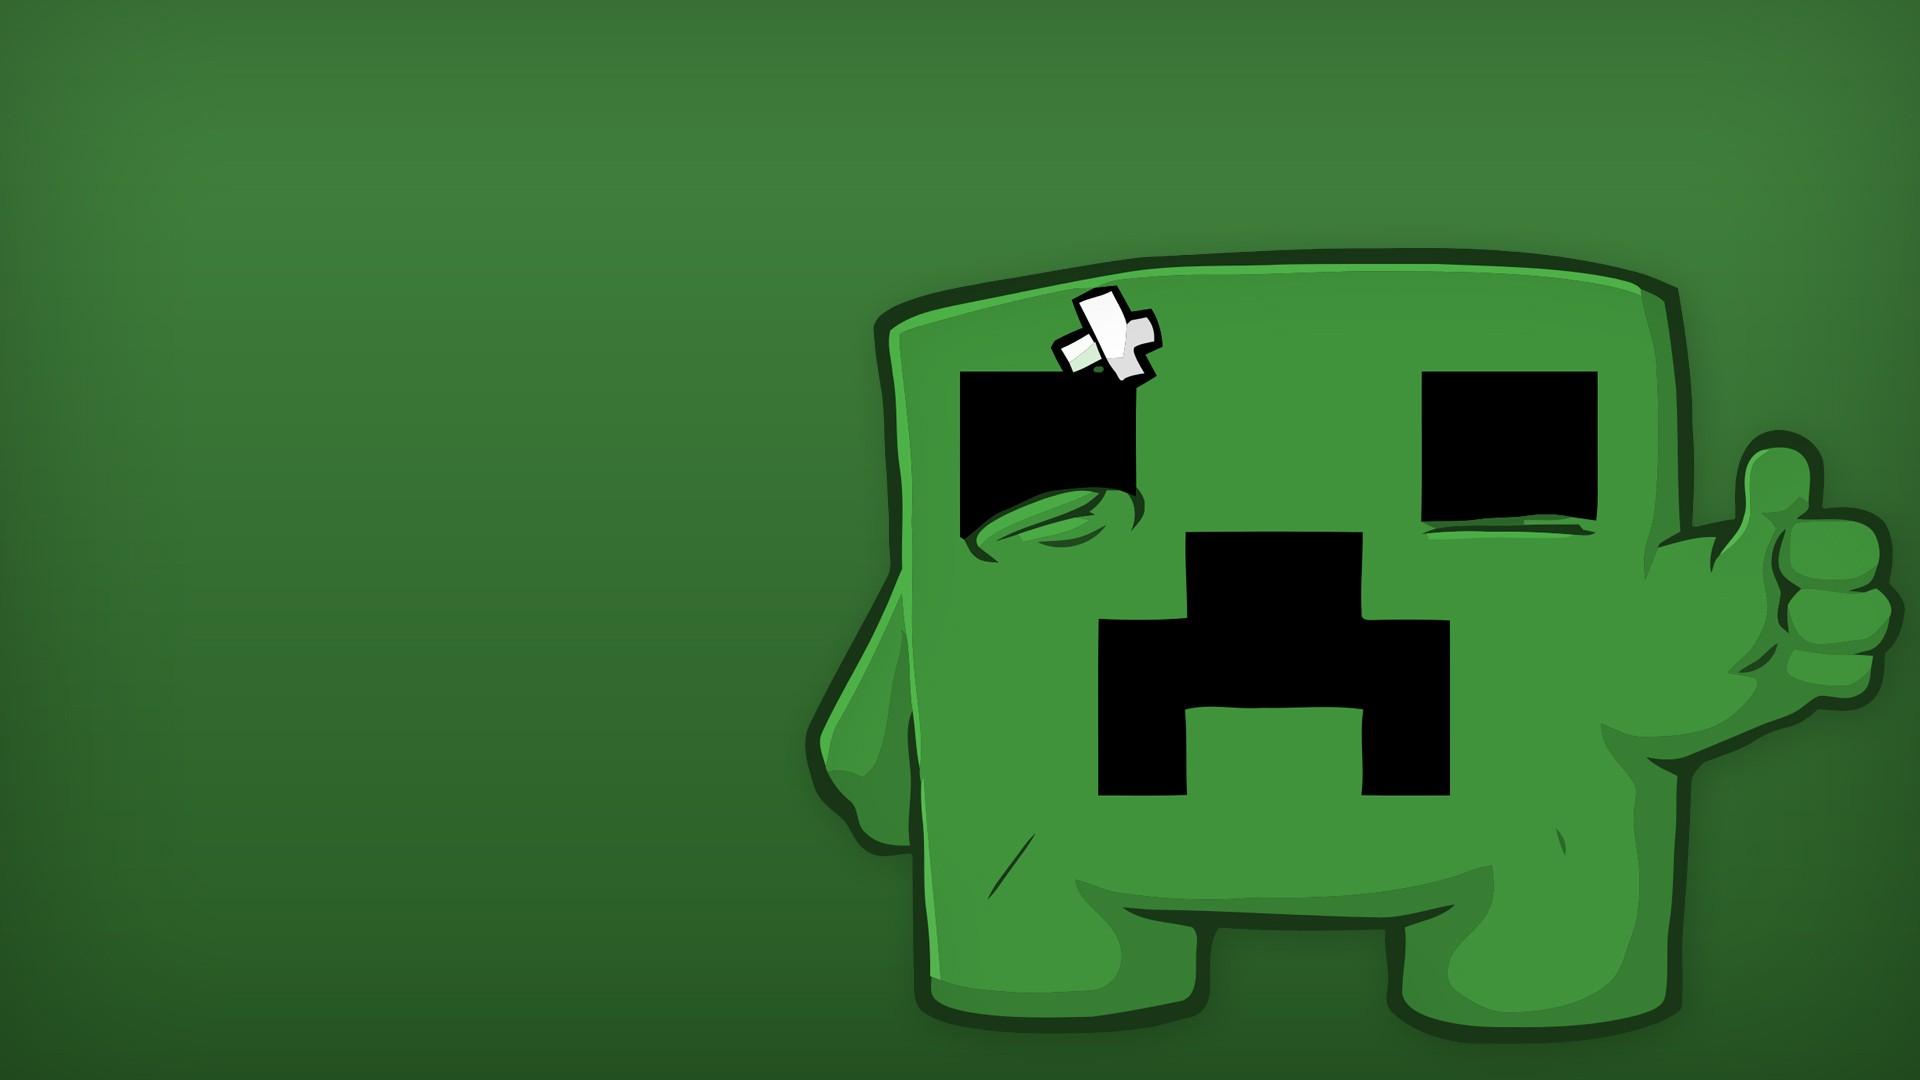 Wonderful Wallpaper Minecraft Windows 8 - funny-minecraft-wallpaper-18  Trends_111957.jpg